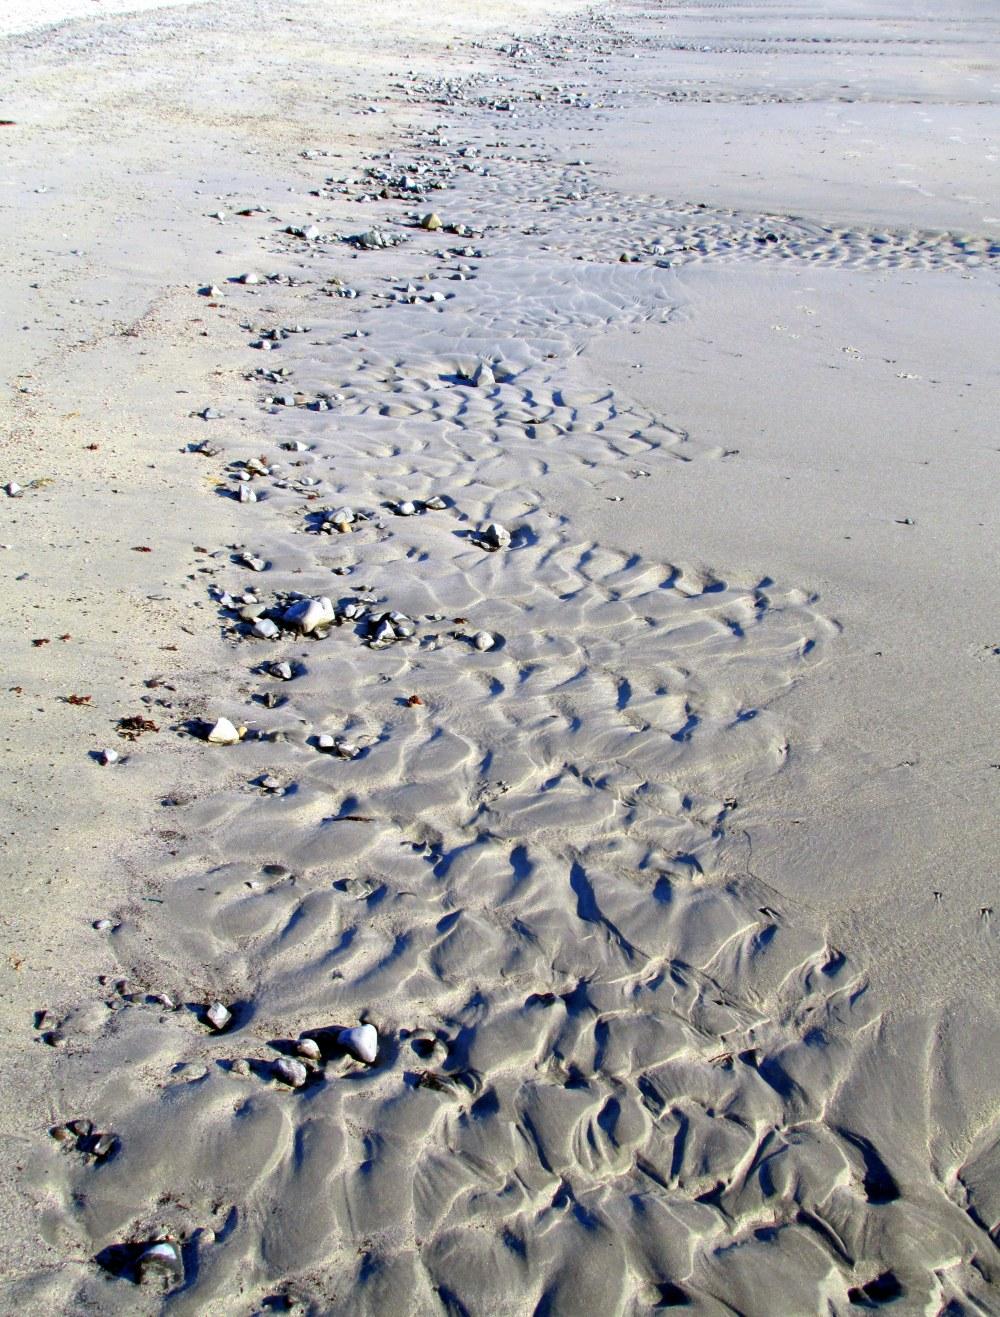 beachrocklineSeasideInn31Dec2014